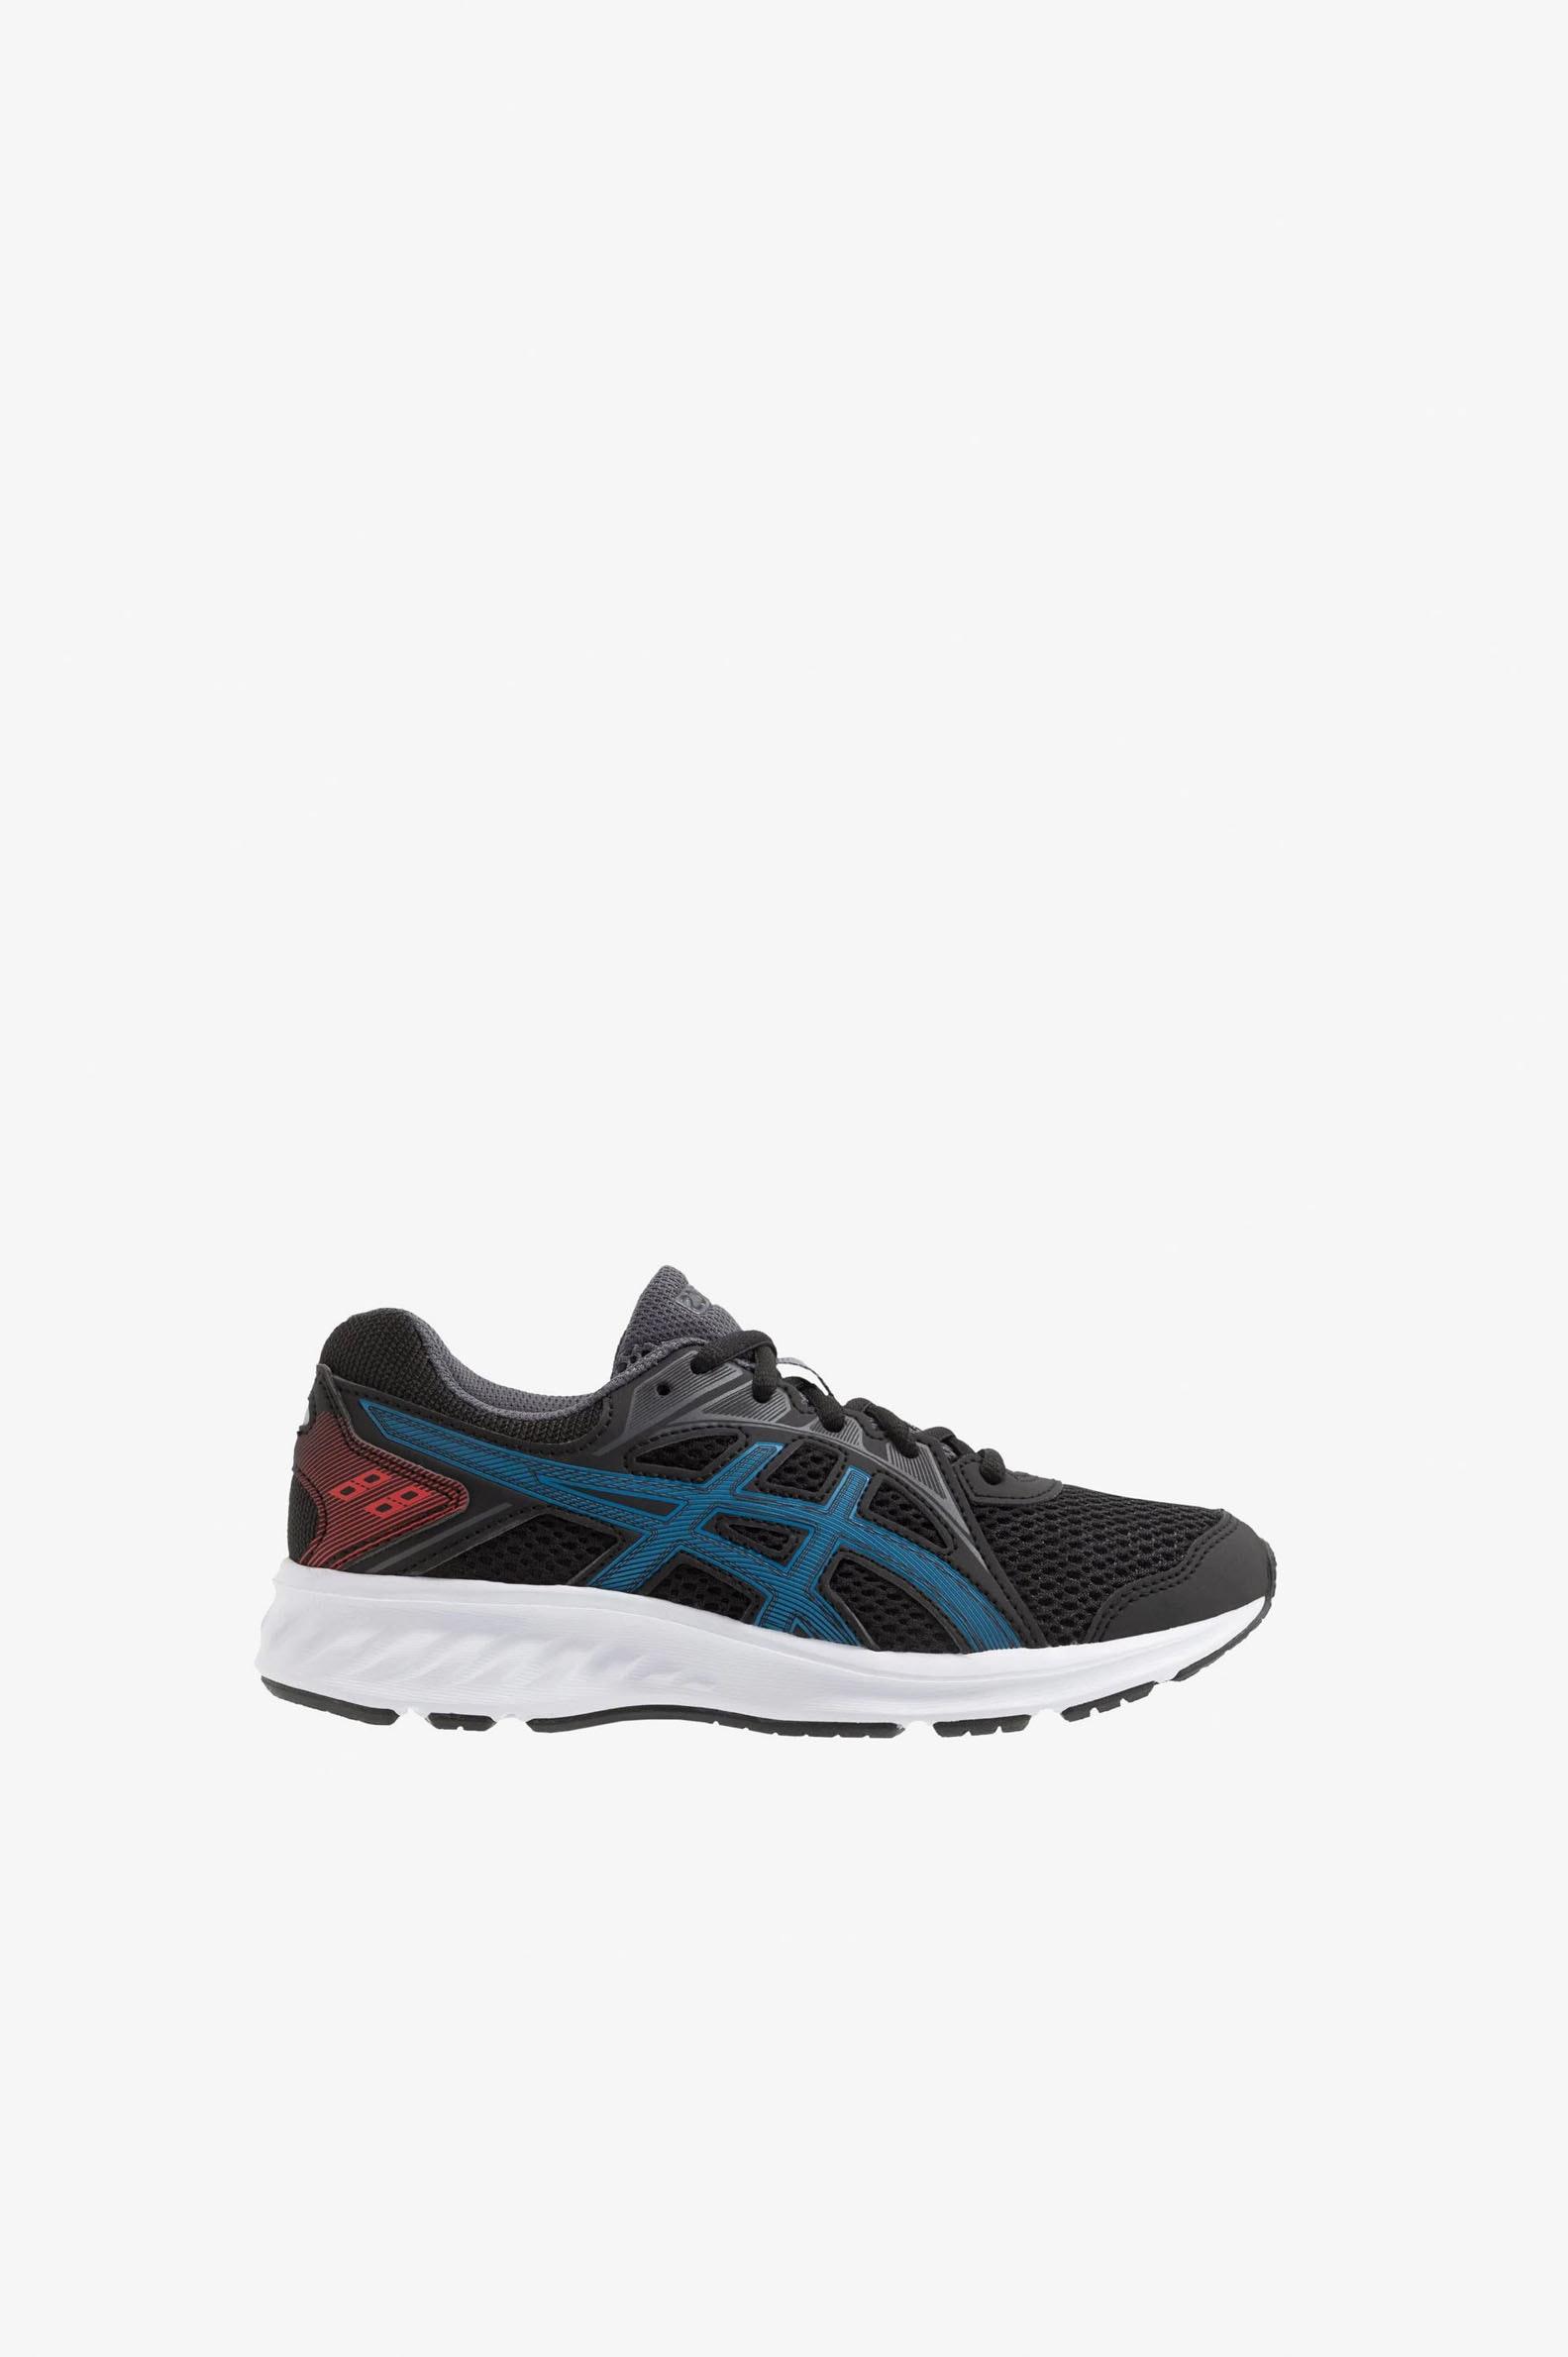 Chaussures running asics tiger jolt garcon